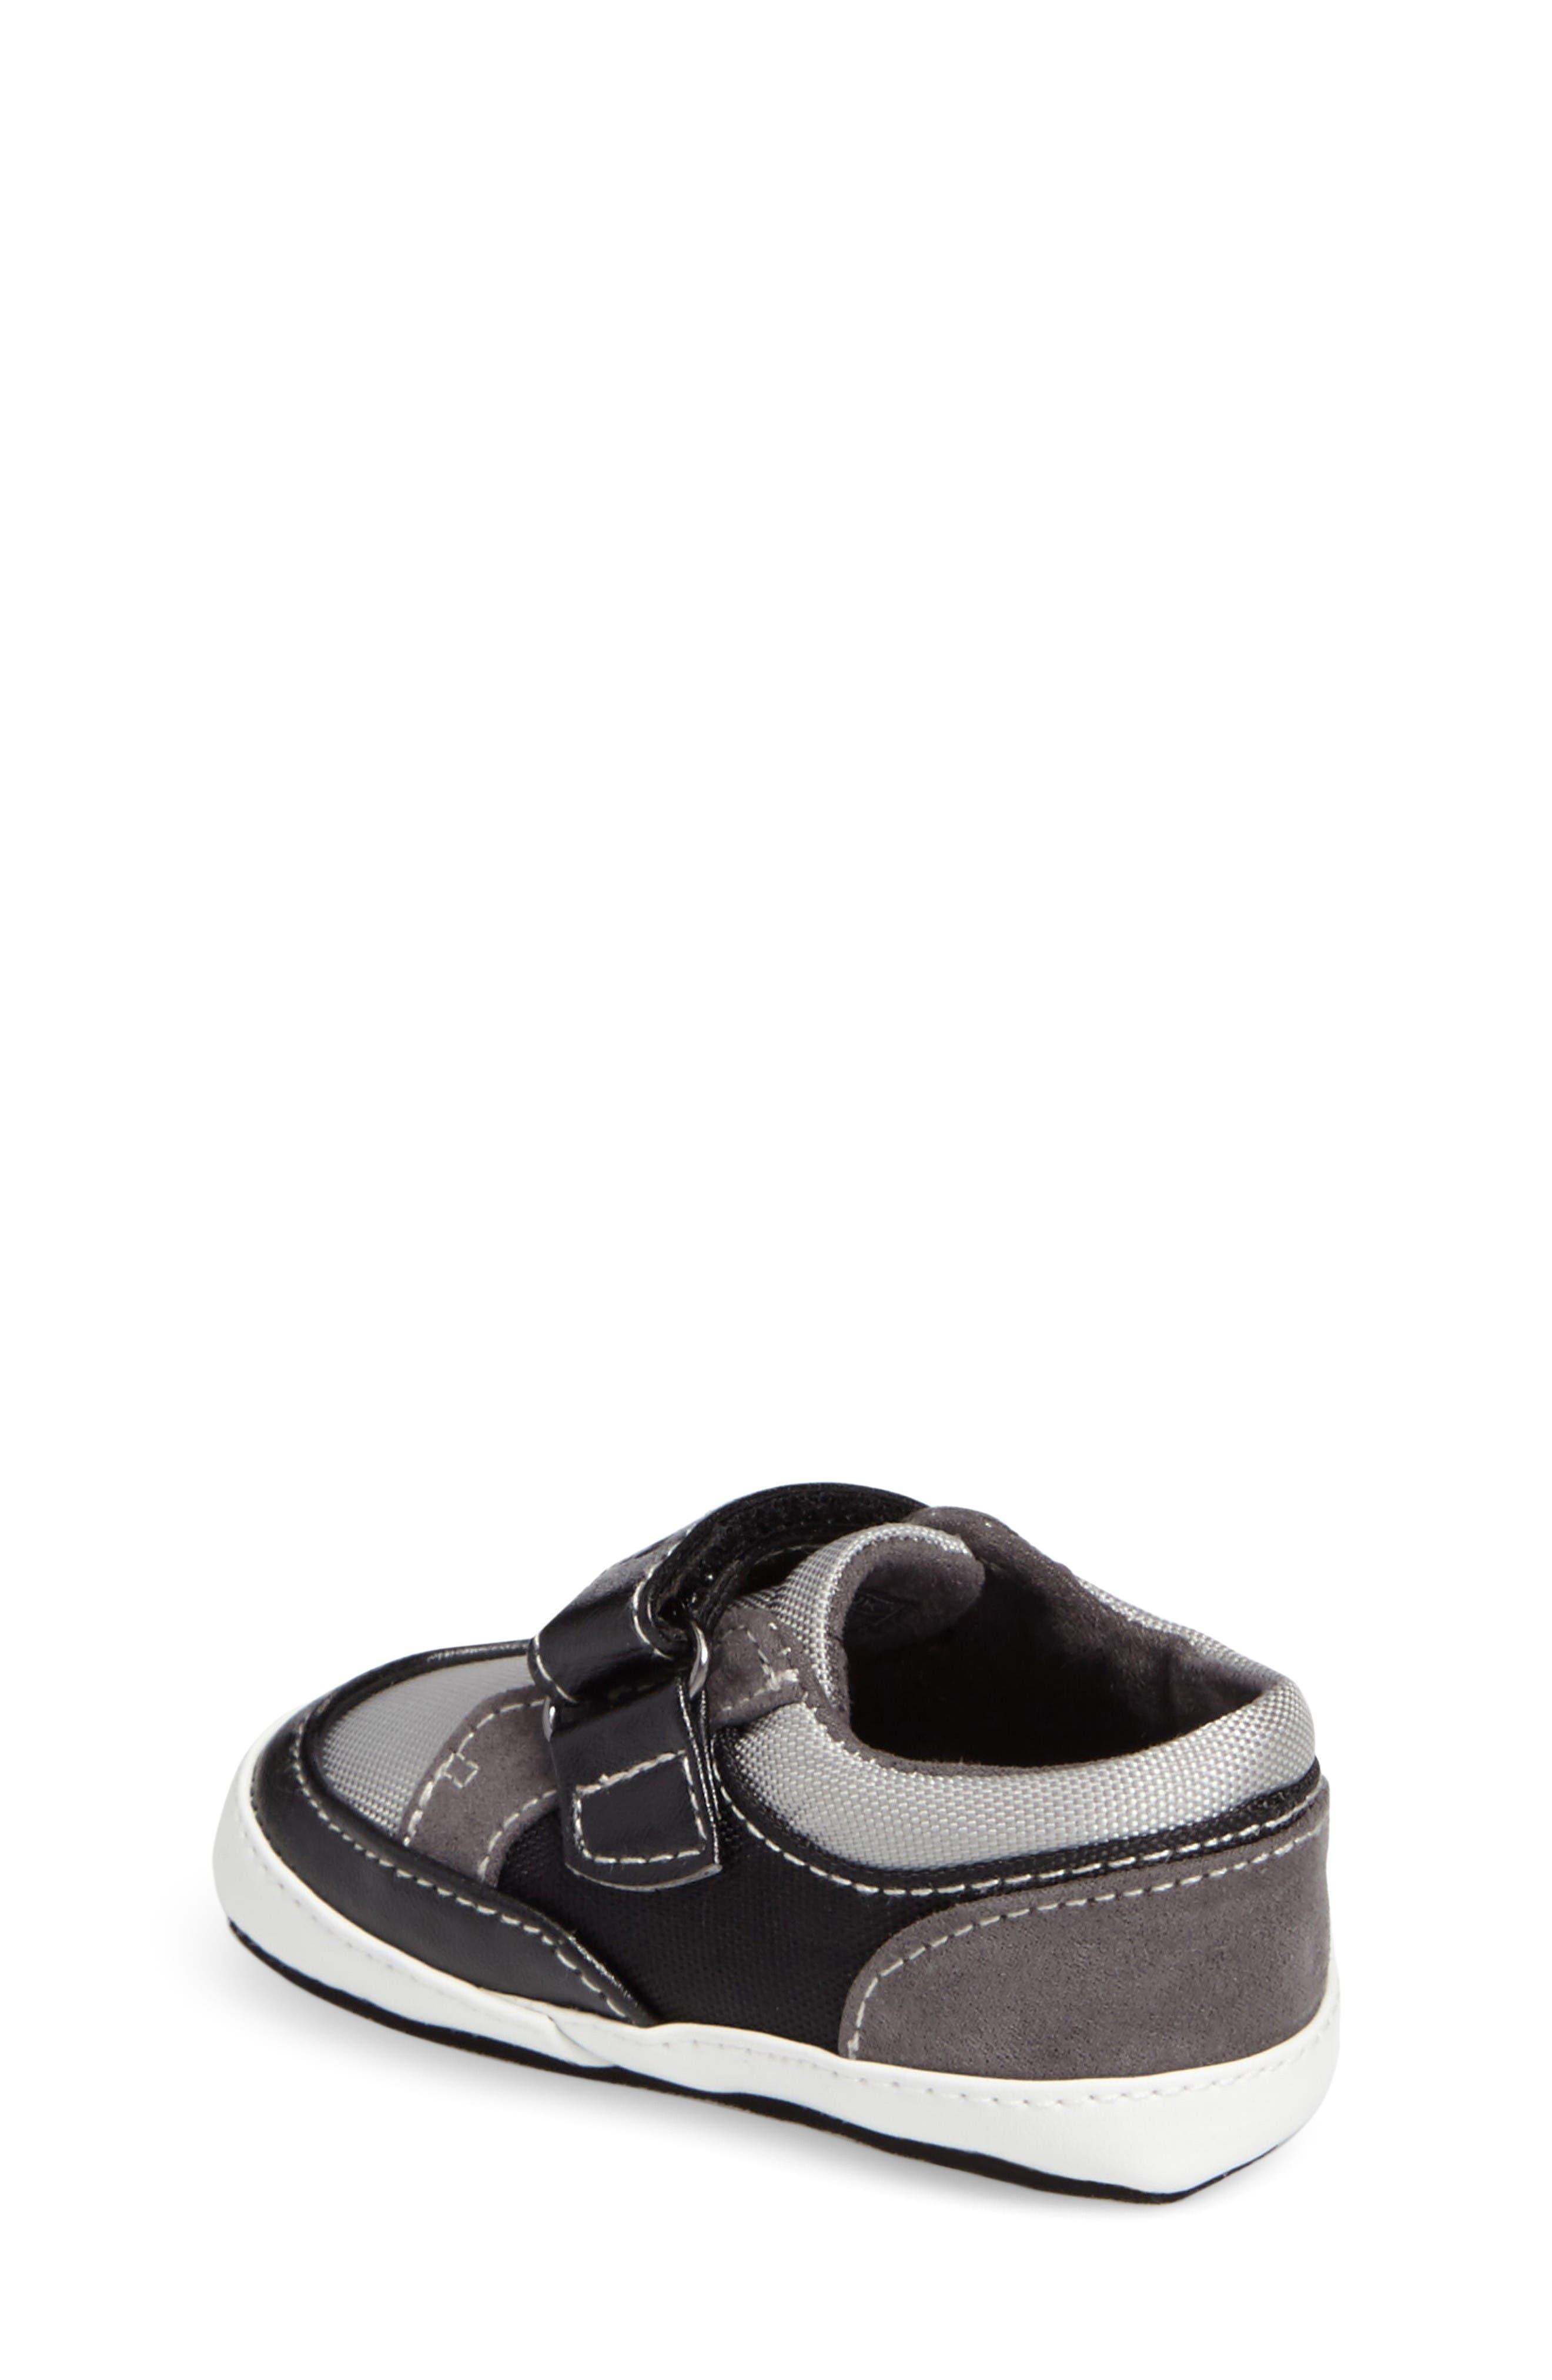 Alternate Image 2  - Kenneth Cole New York Danny Sneaker (Baby)